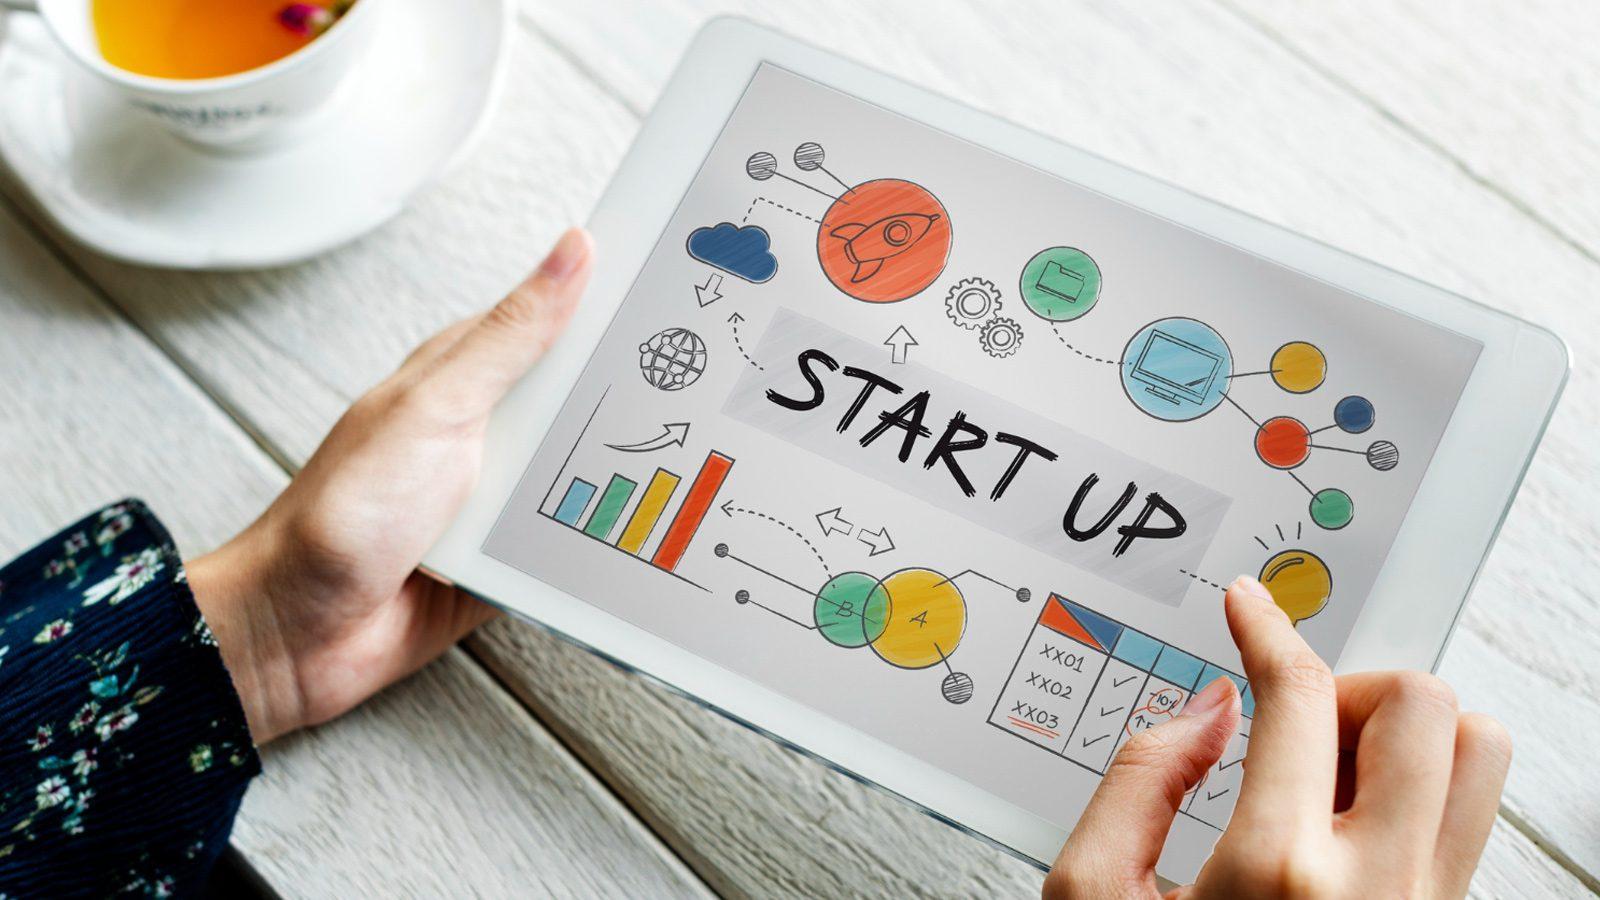 Public Sector Startups